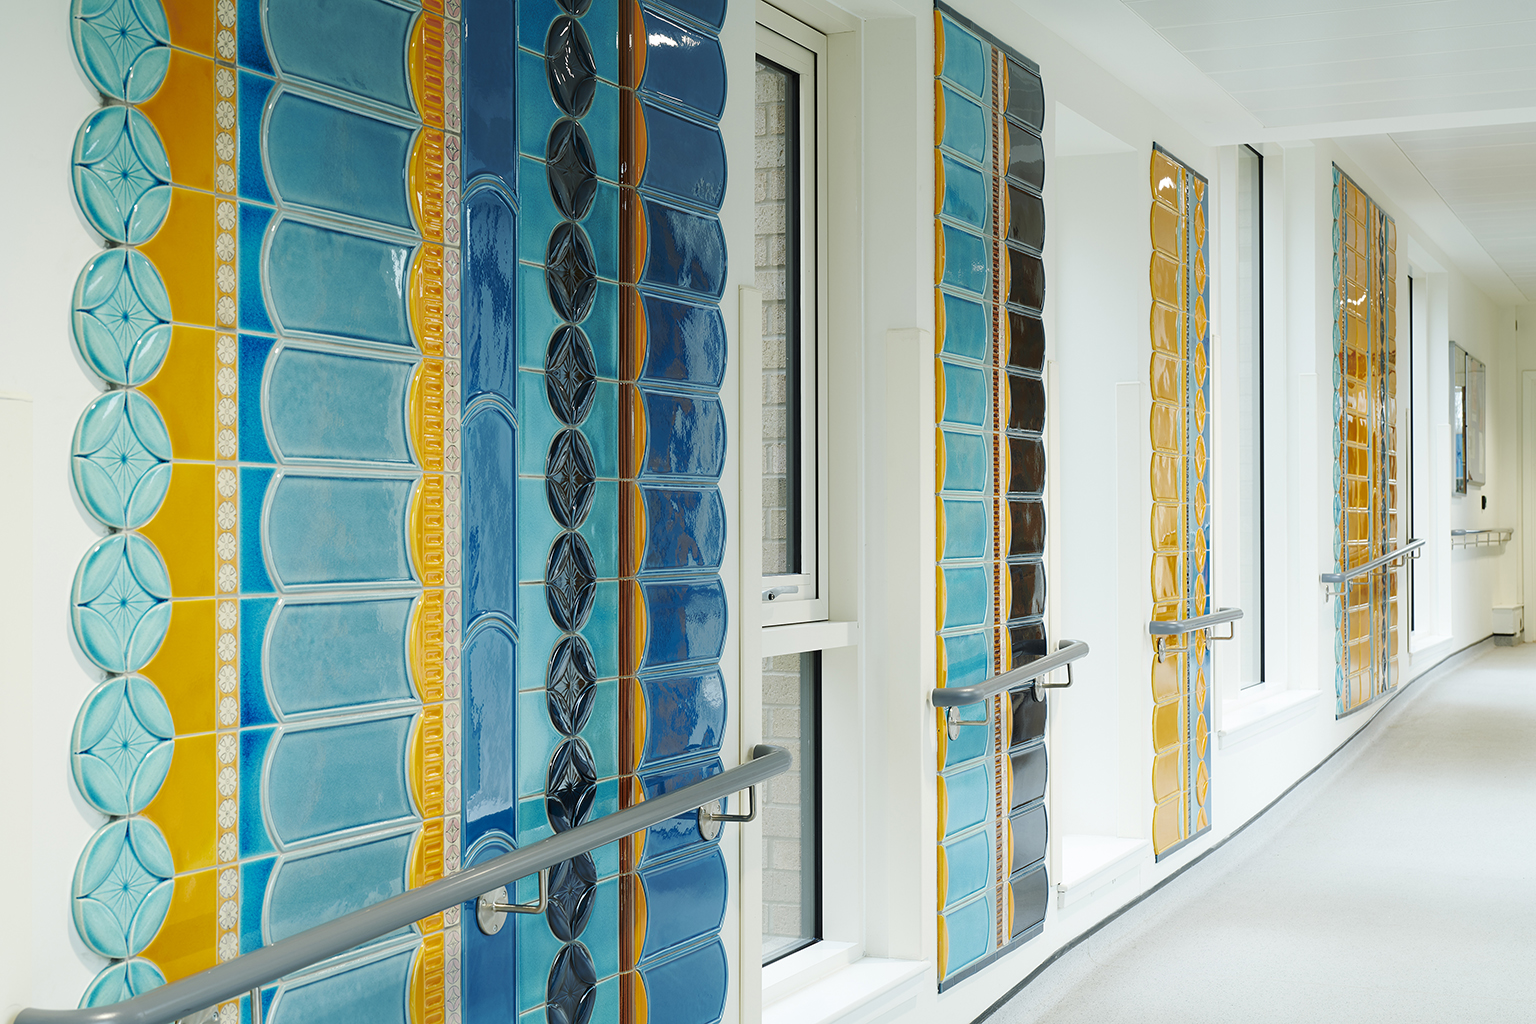 The Tiled Corridor